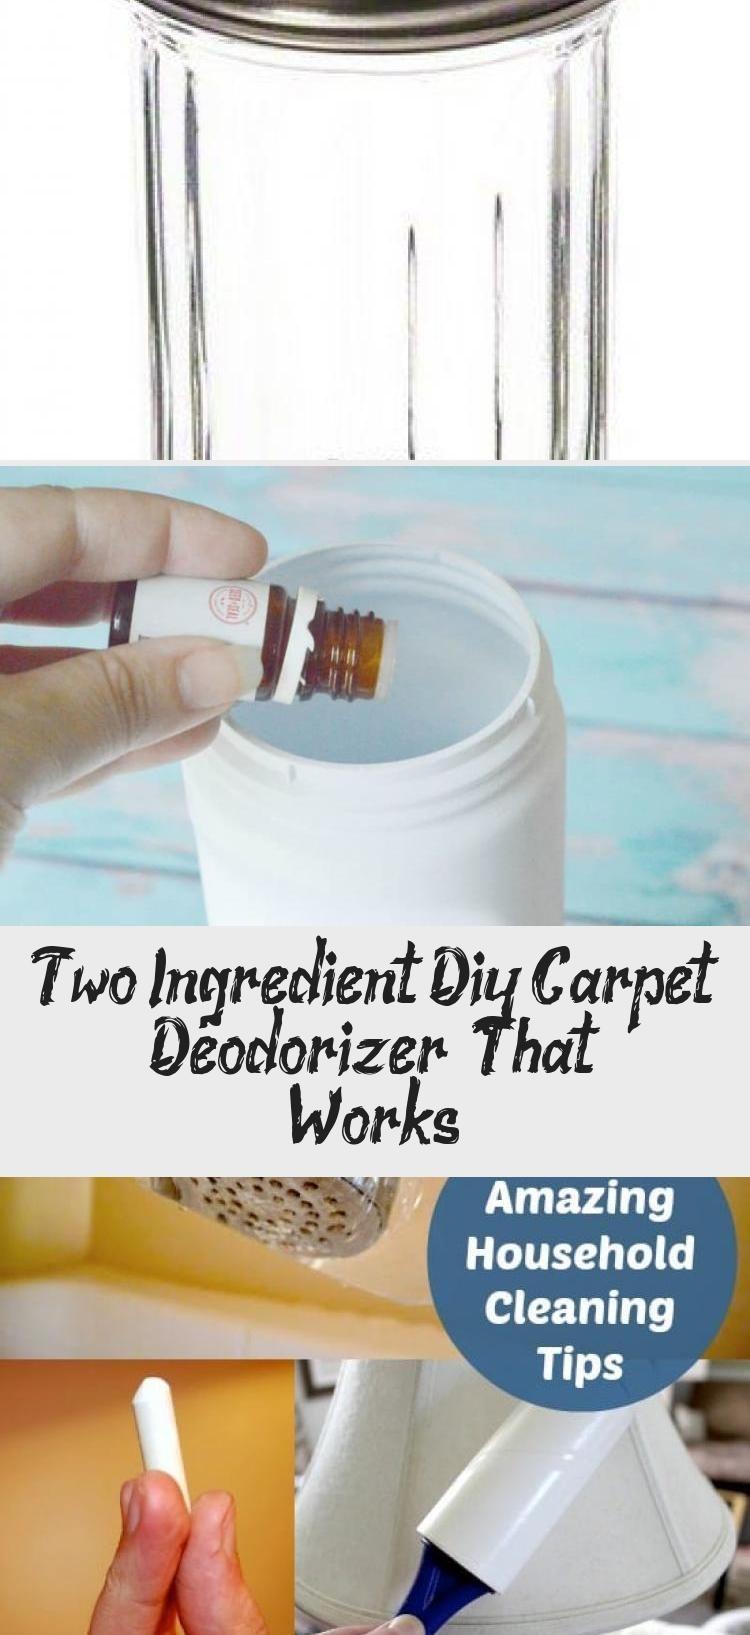 Two Ingredient Diy Carpet Deodorizer That Works In 2020 Diy Carpet Homemade Carpet Stain Remover Carpet Deodorizer